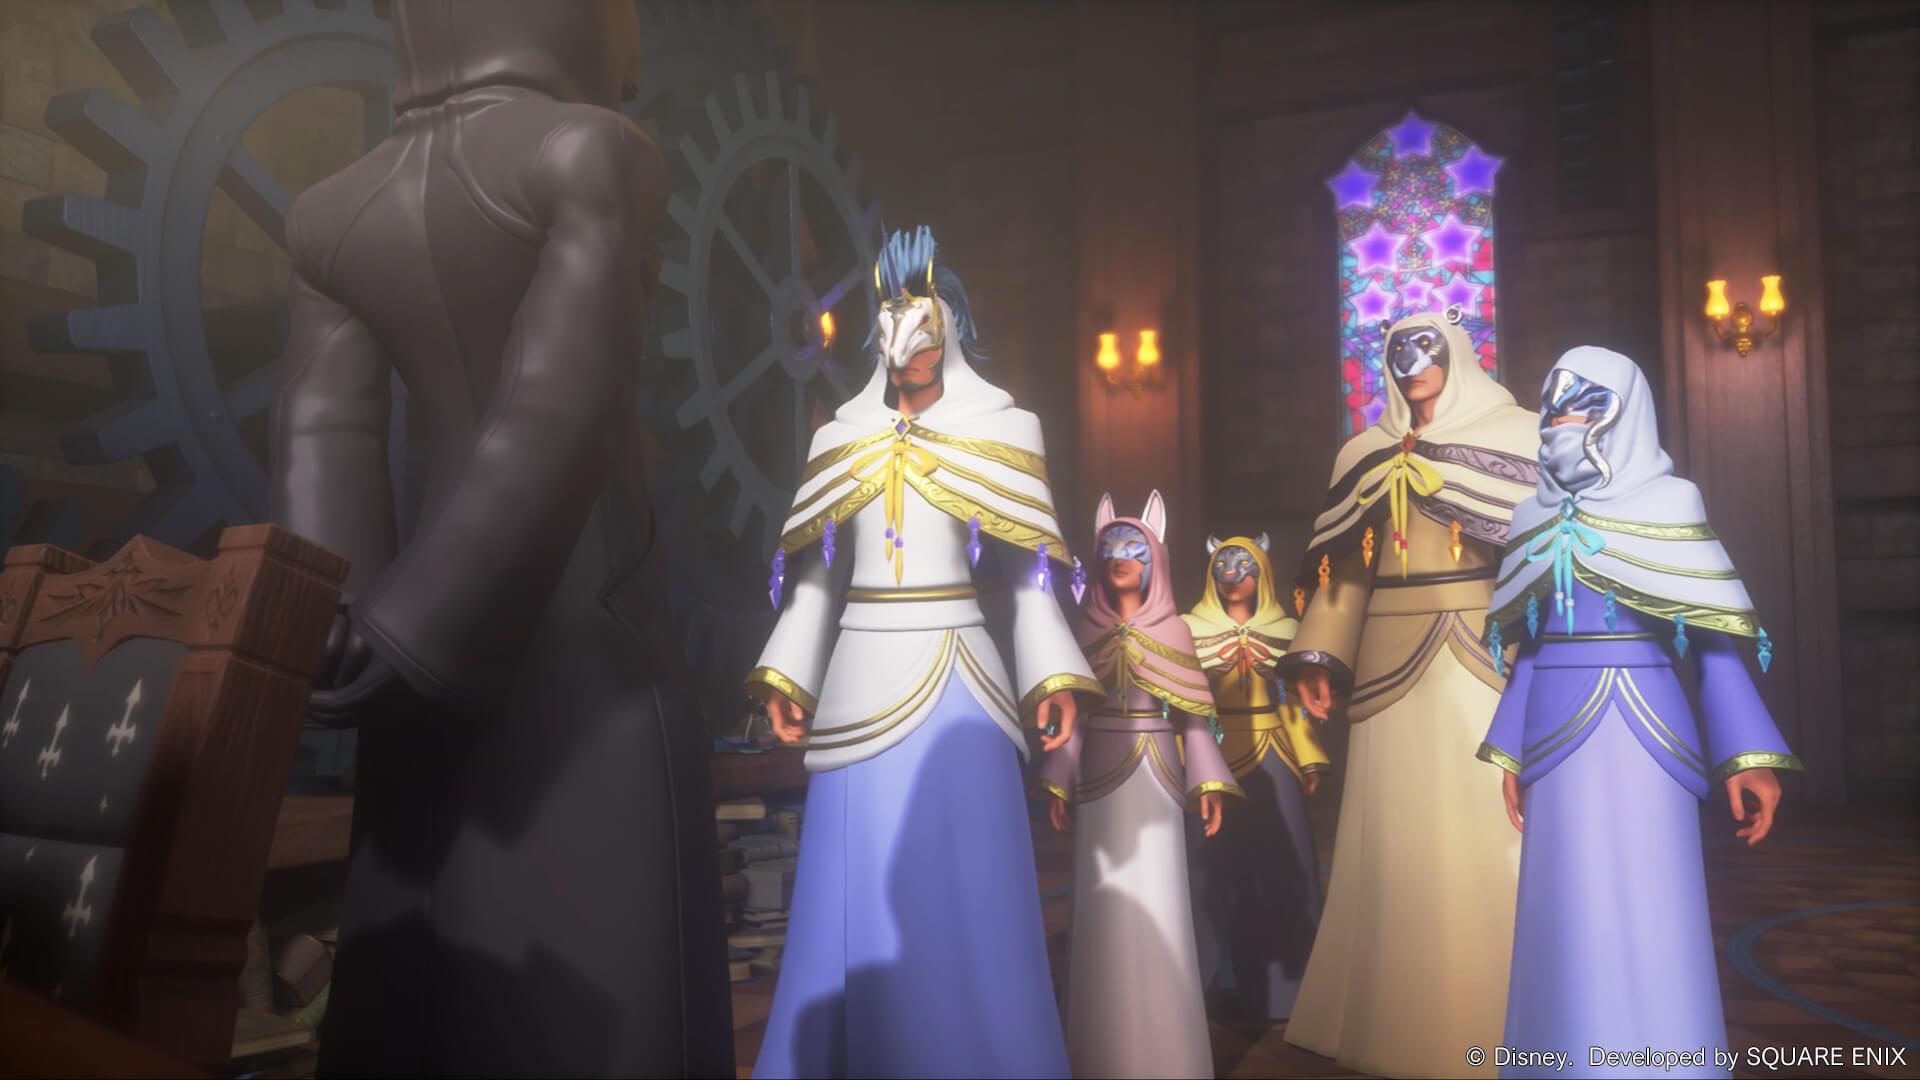 kingdom-hearts-hd-2.8-final-chapter-prologue-pc-screenshot-1